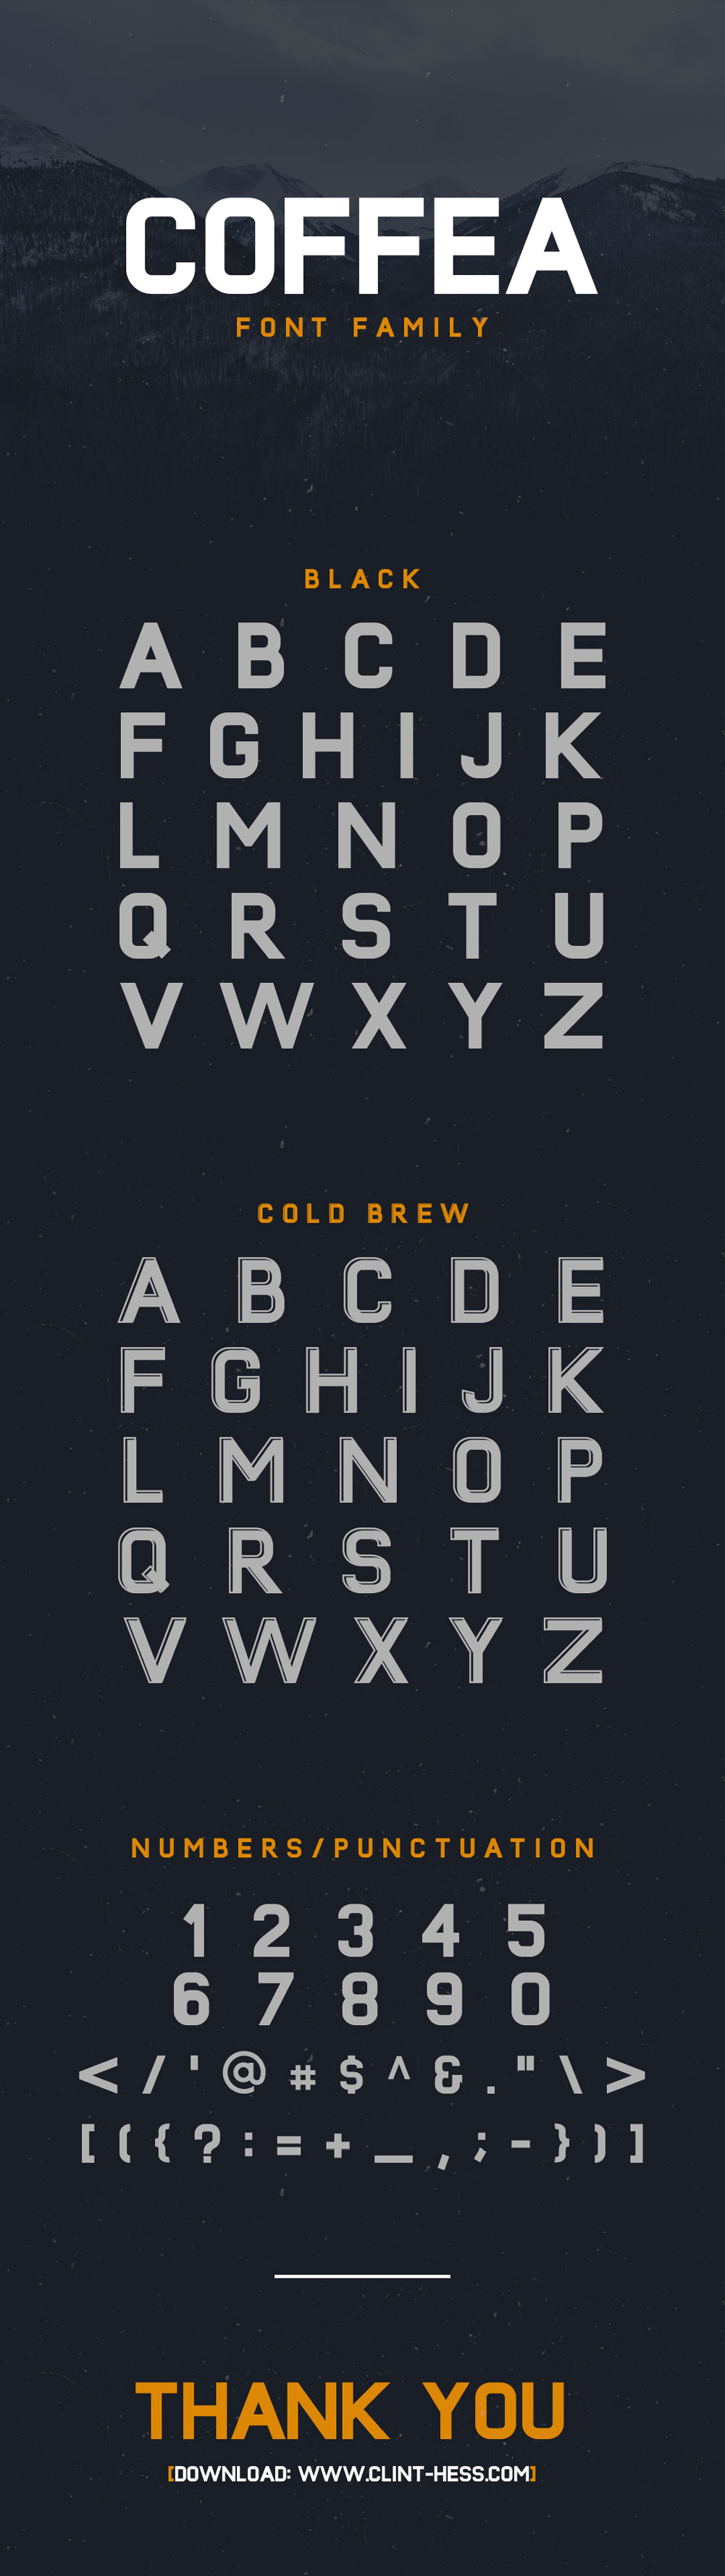 Coffea_Display.jpg